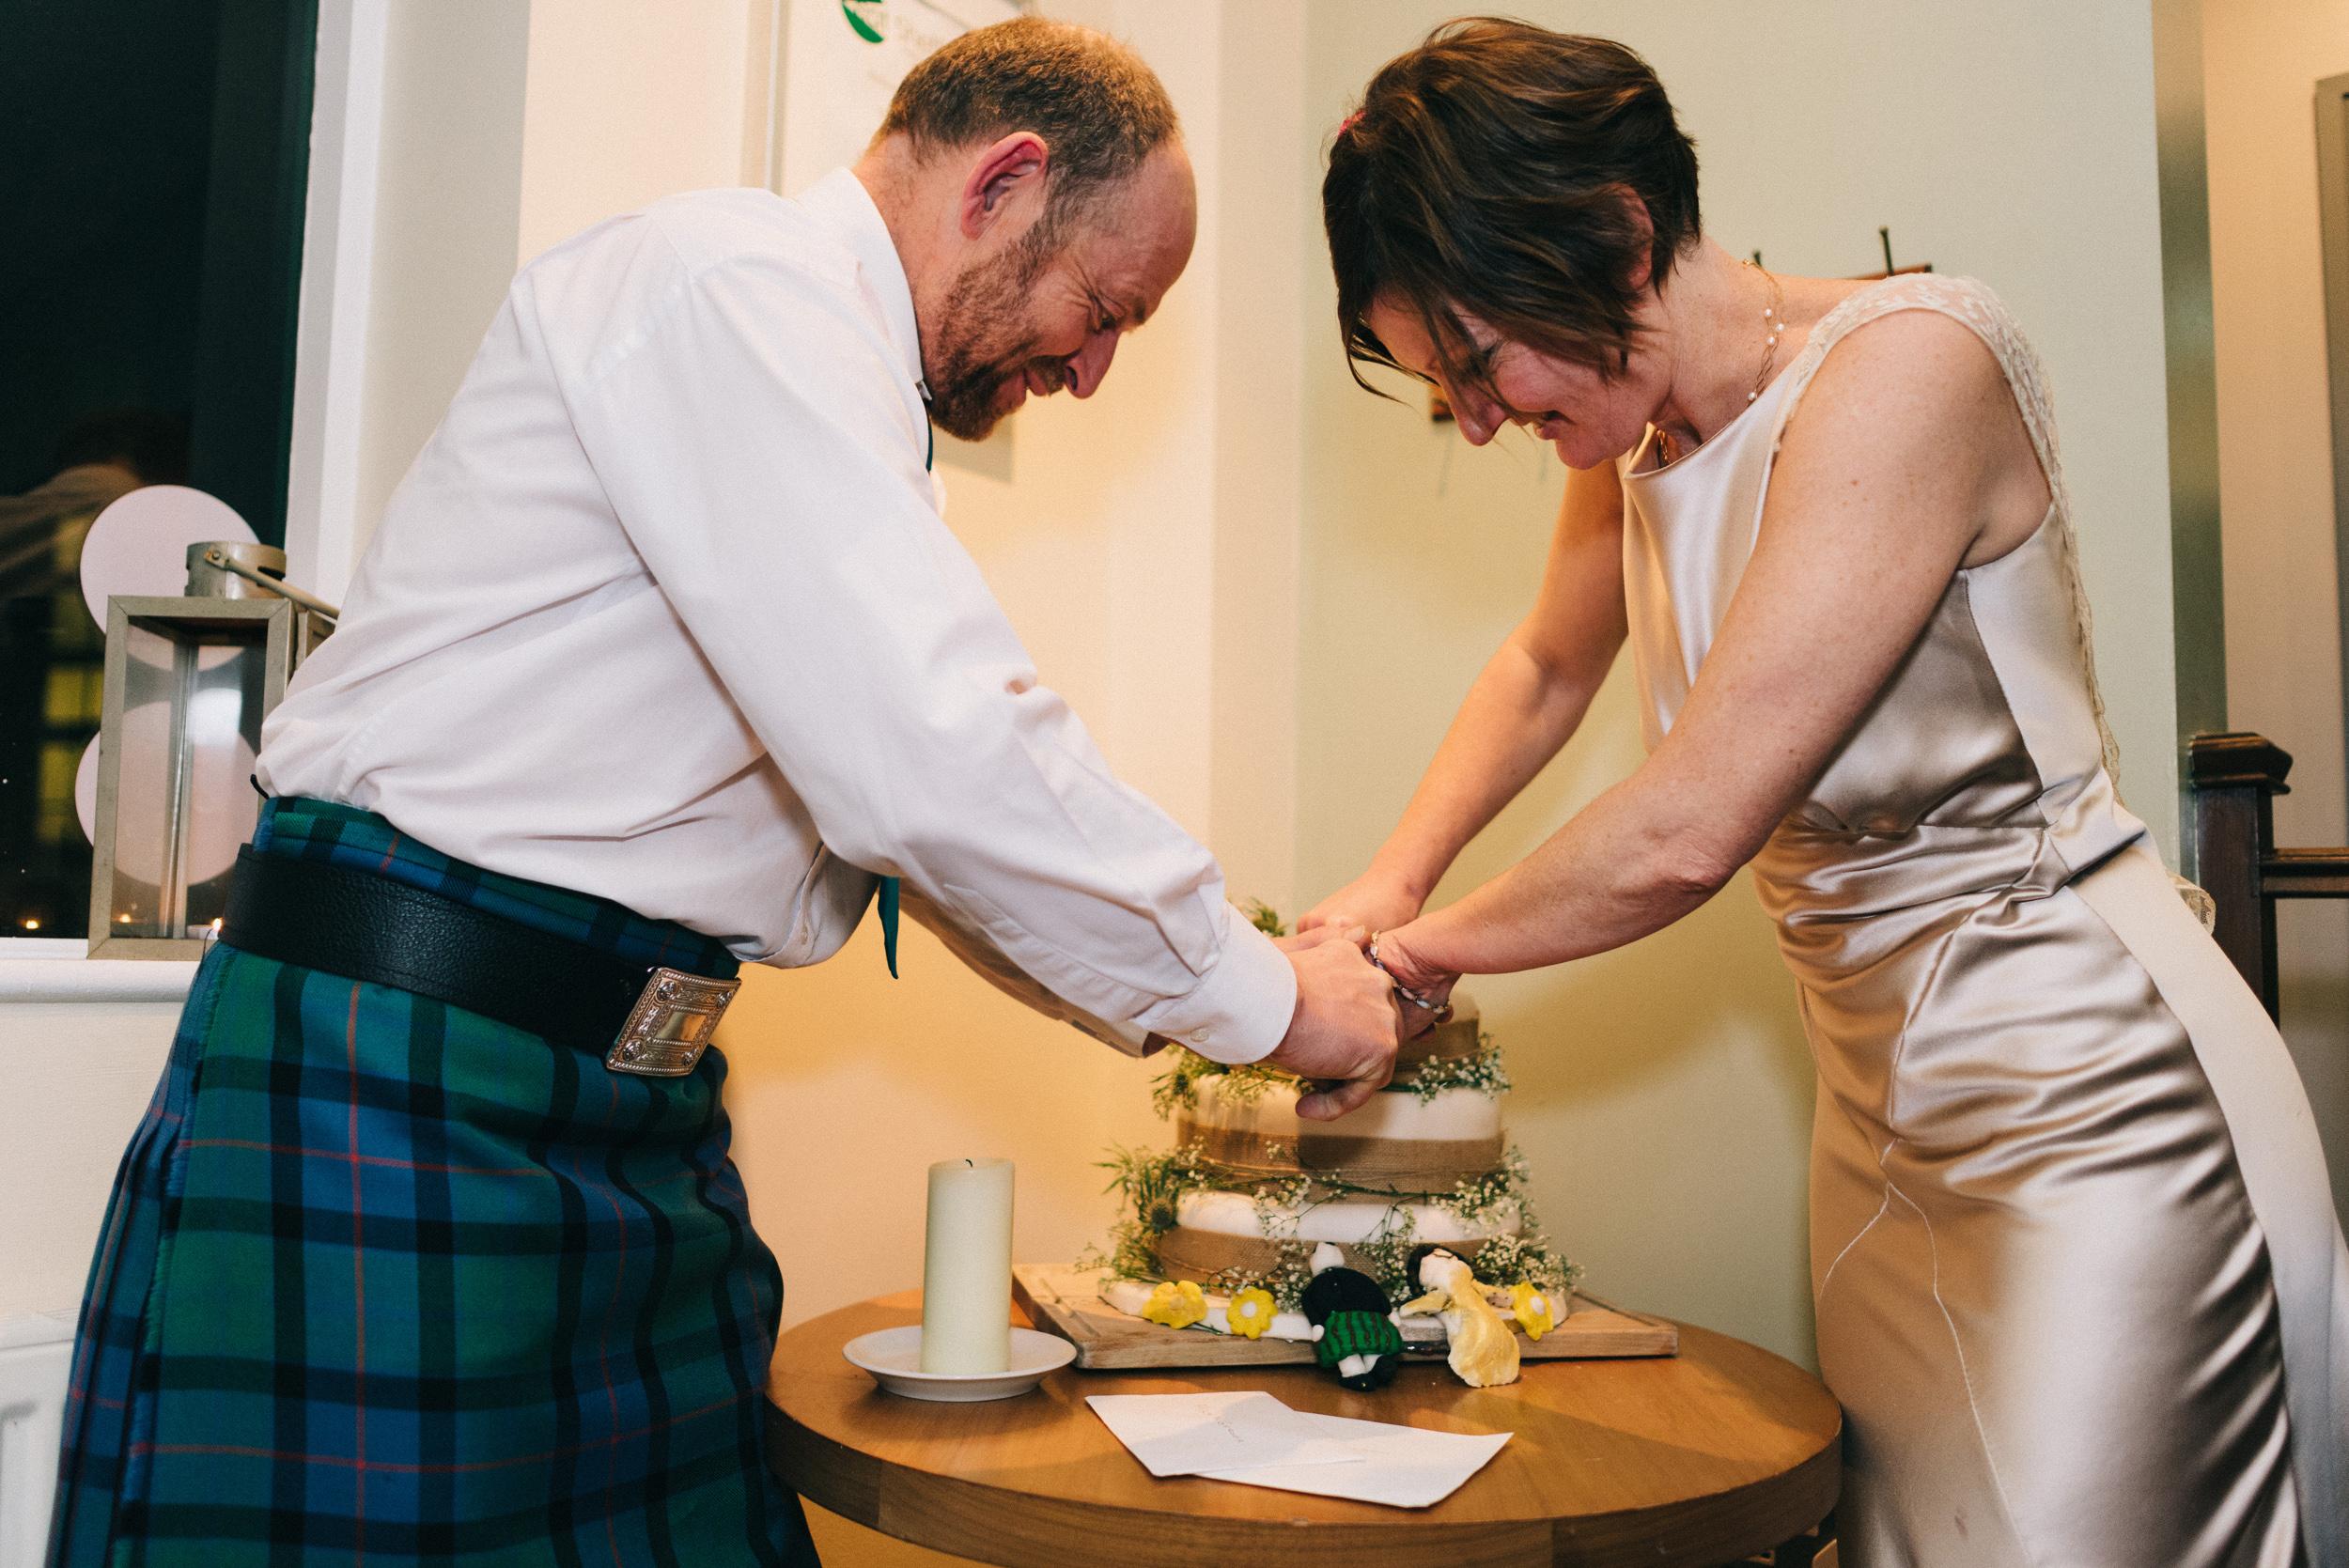 Alice-Bias-Cut-Silk-Wedding-Dress-Kate-Beaumont-Sheffield-Botanical-Gardens-by-Peakography-25.jpg